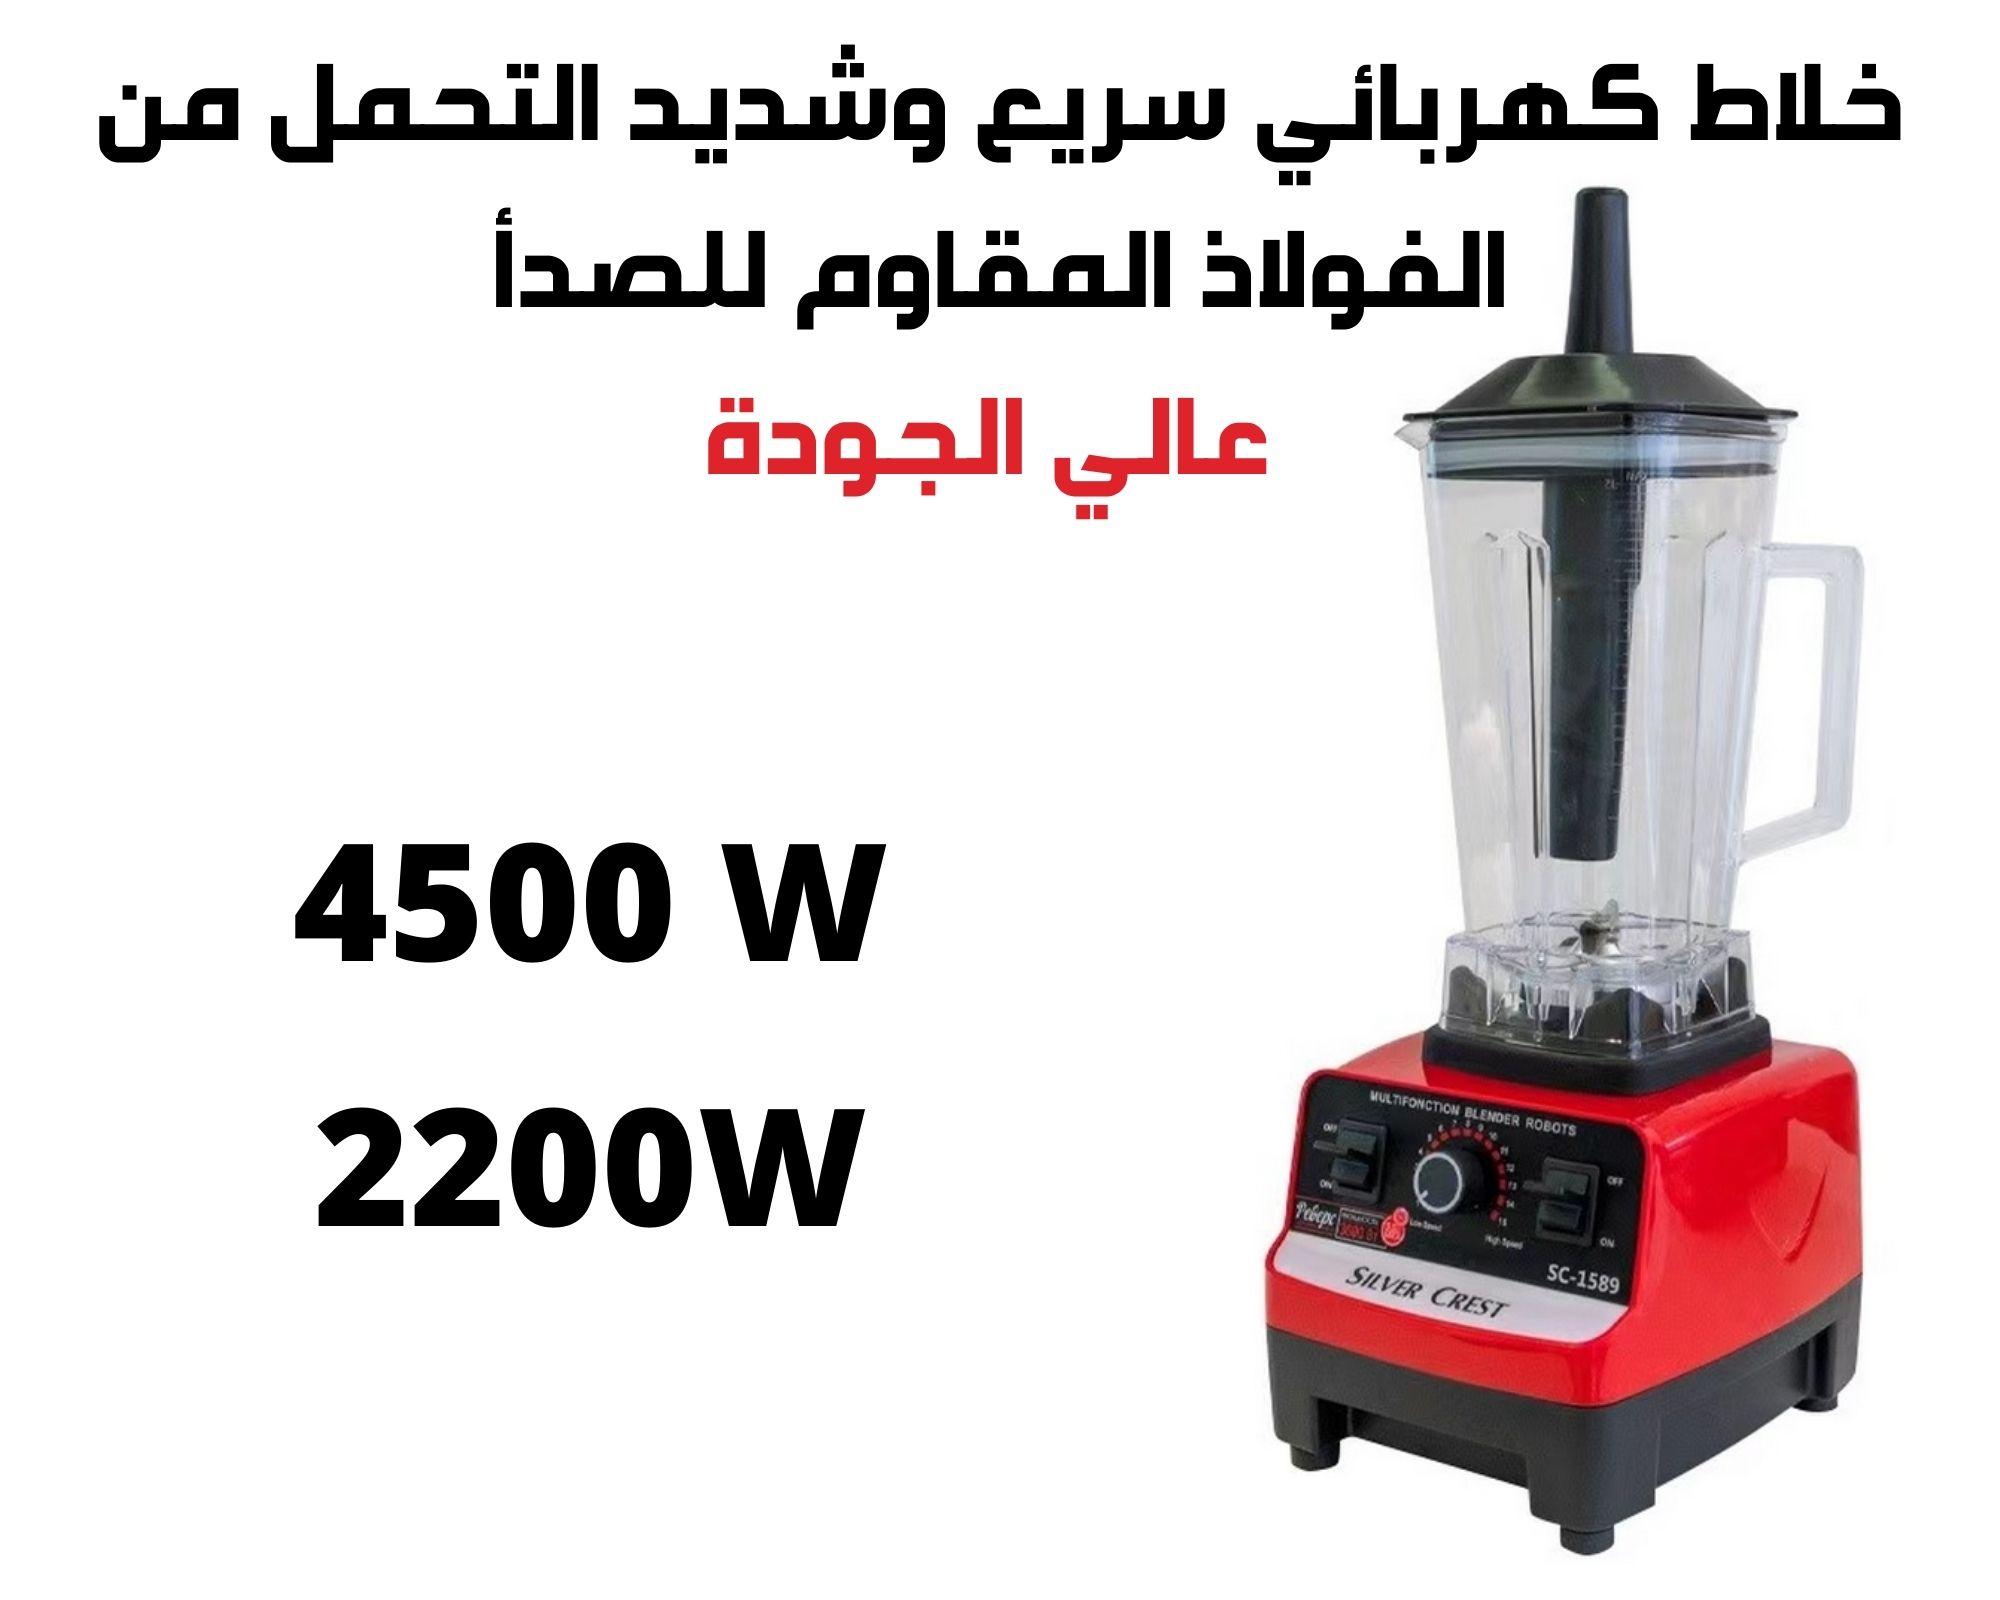 Blender SilverCrest 4500W / 2200W